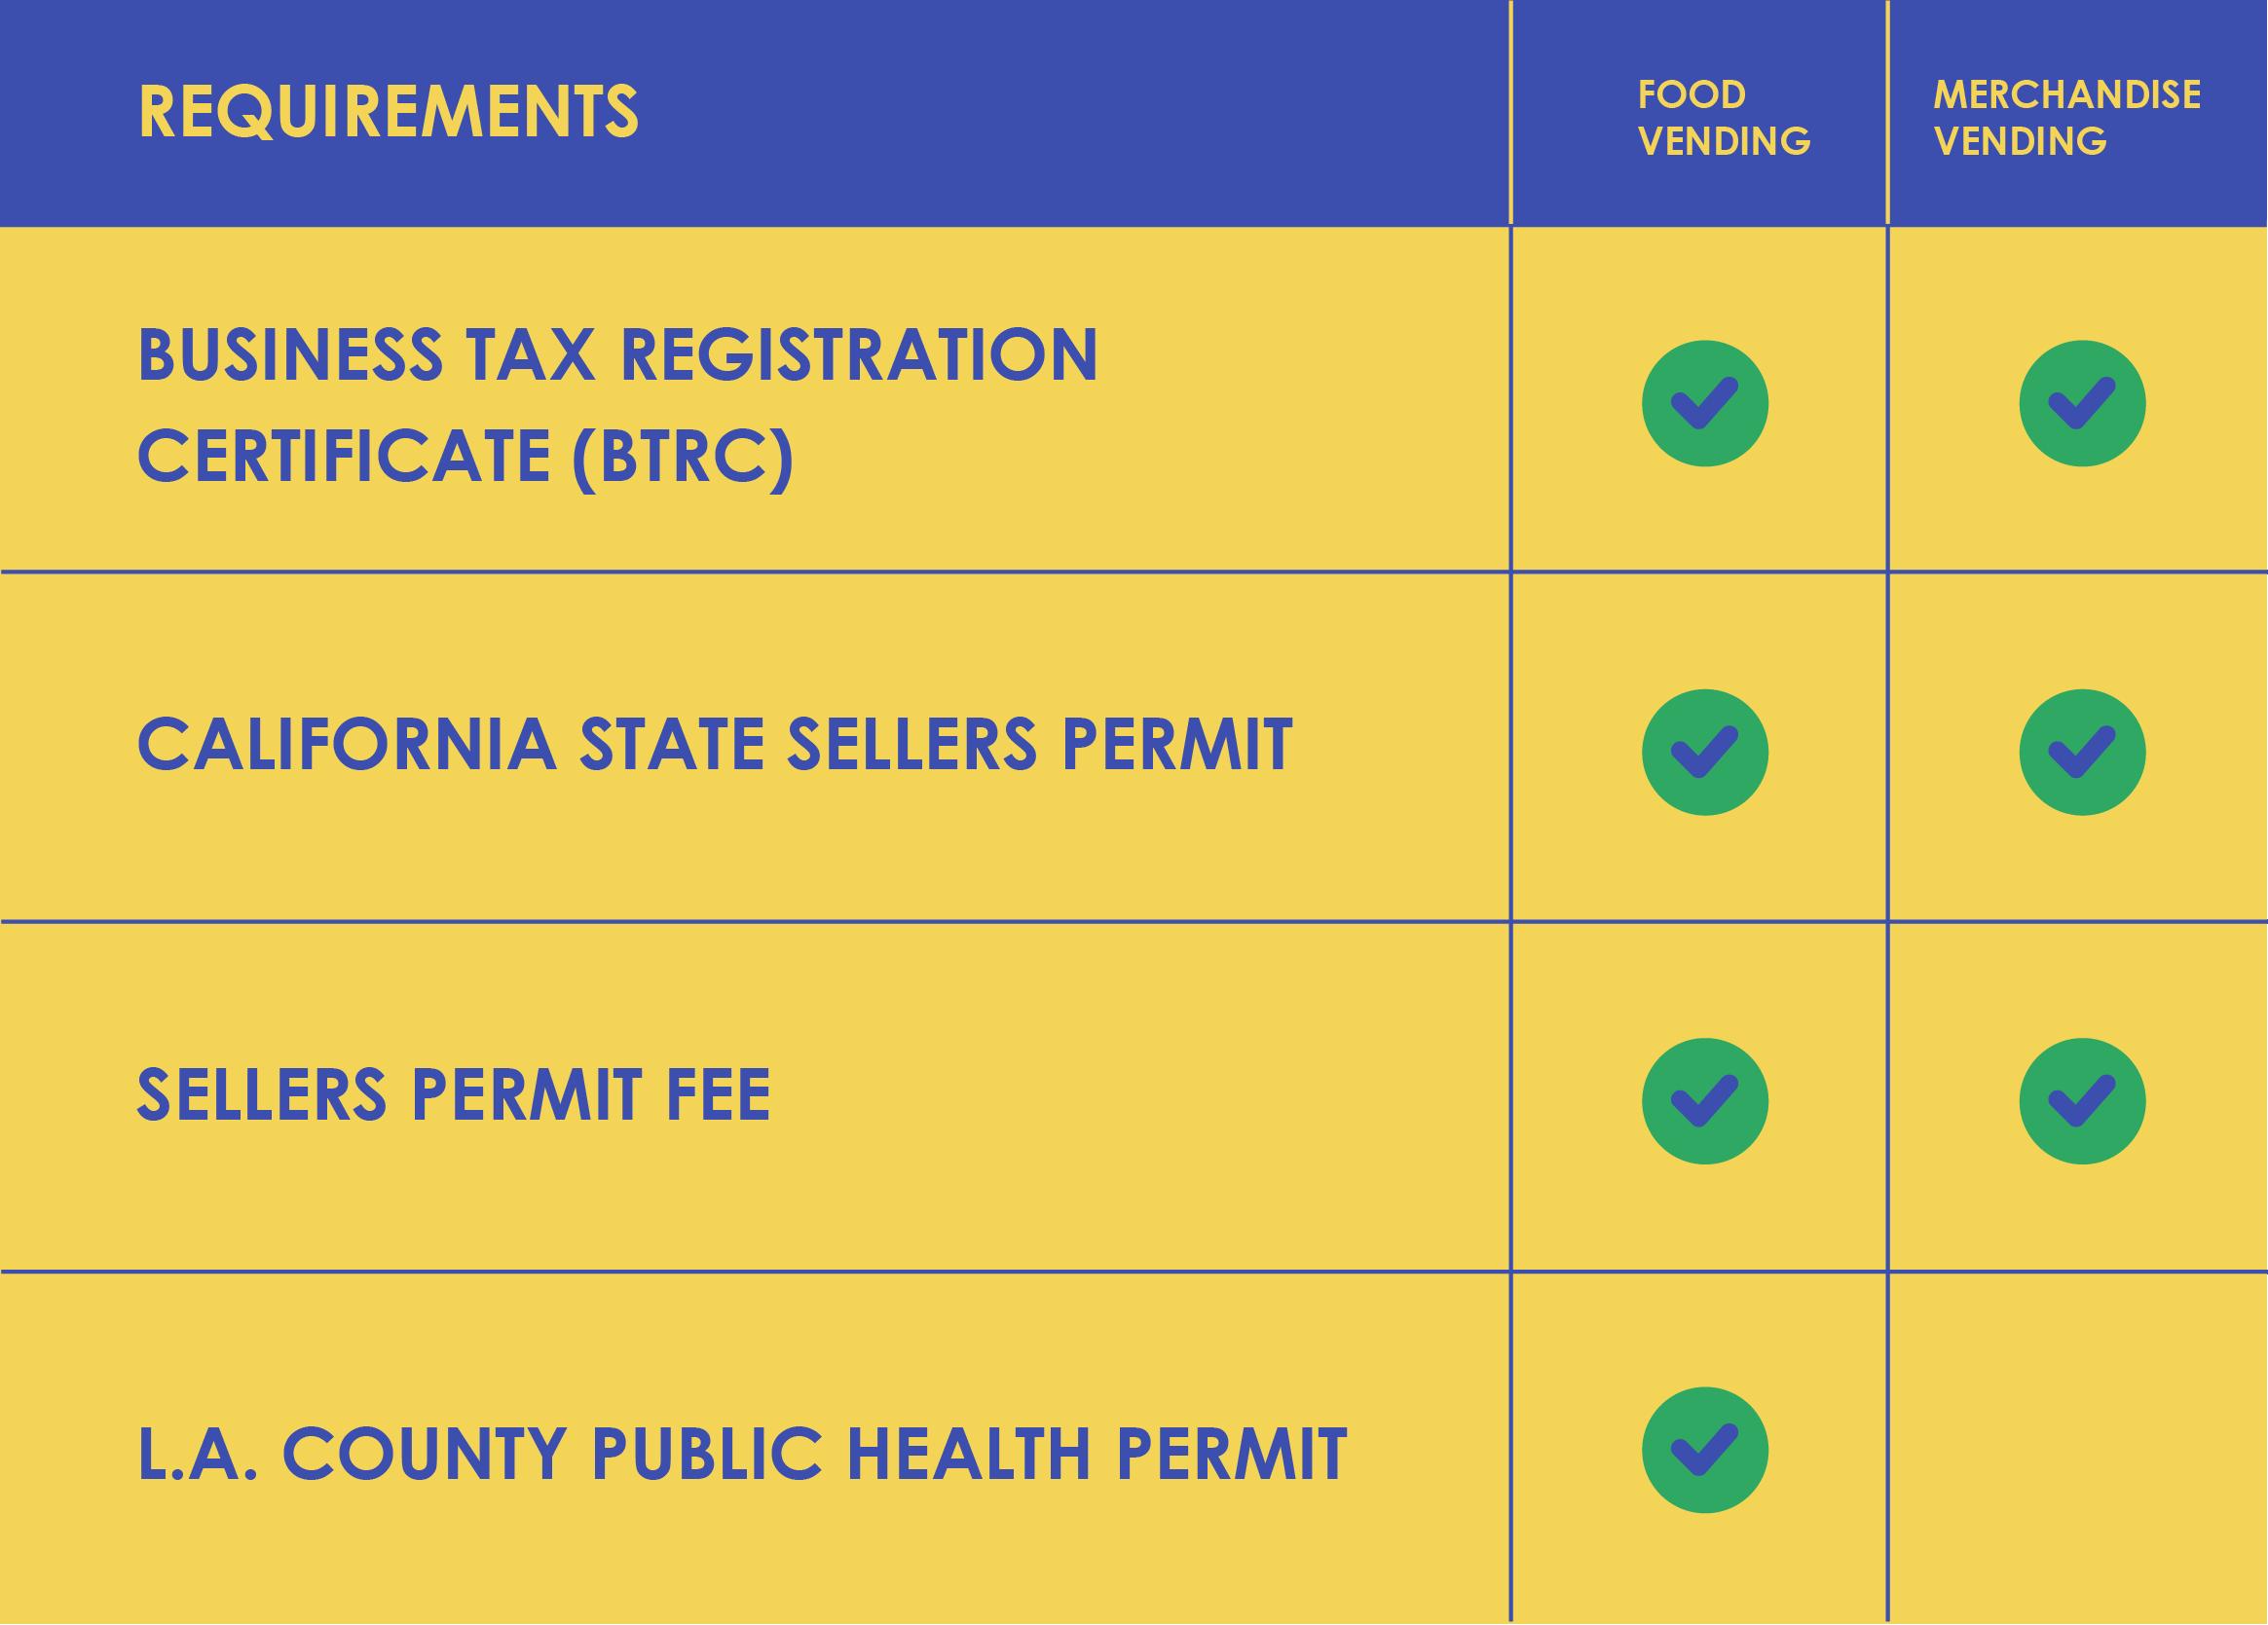 Vending Permit Checklist